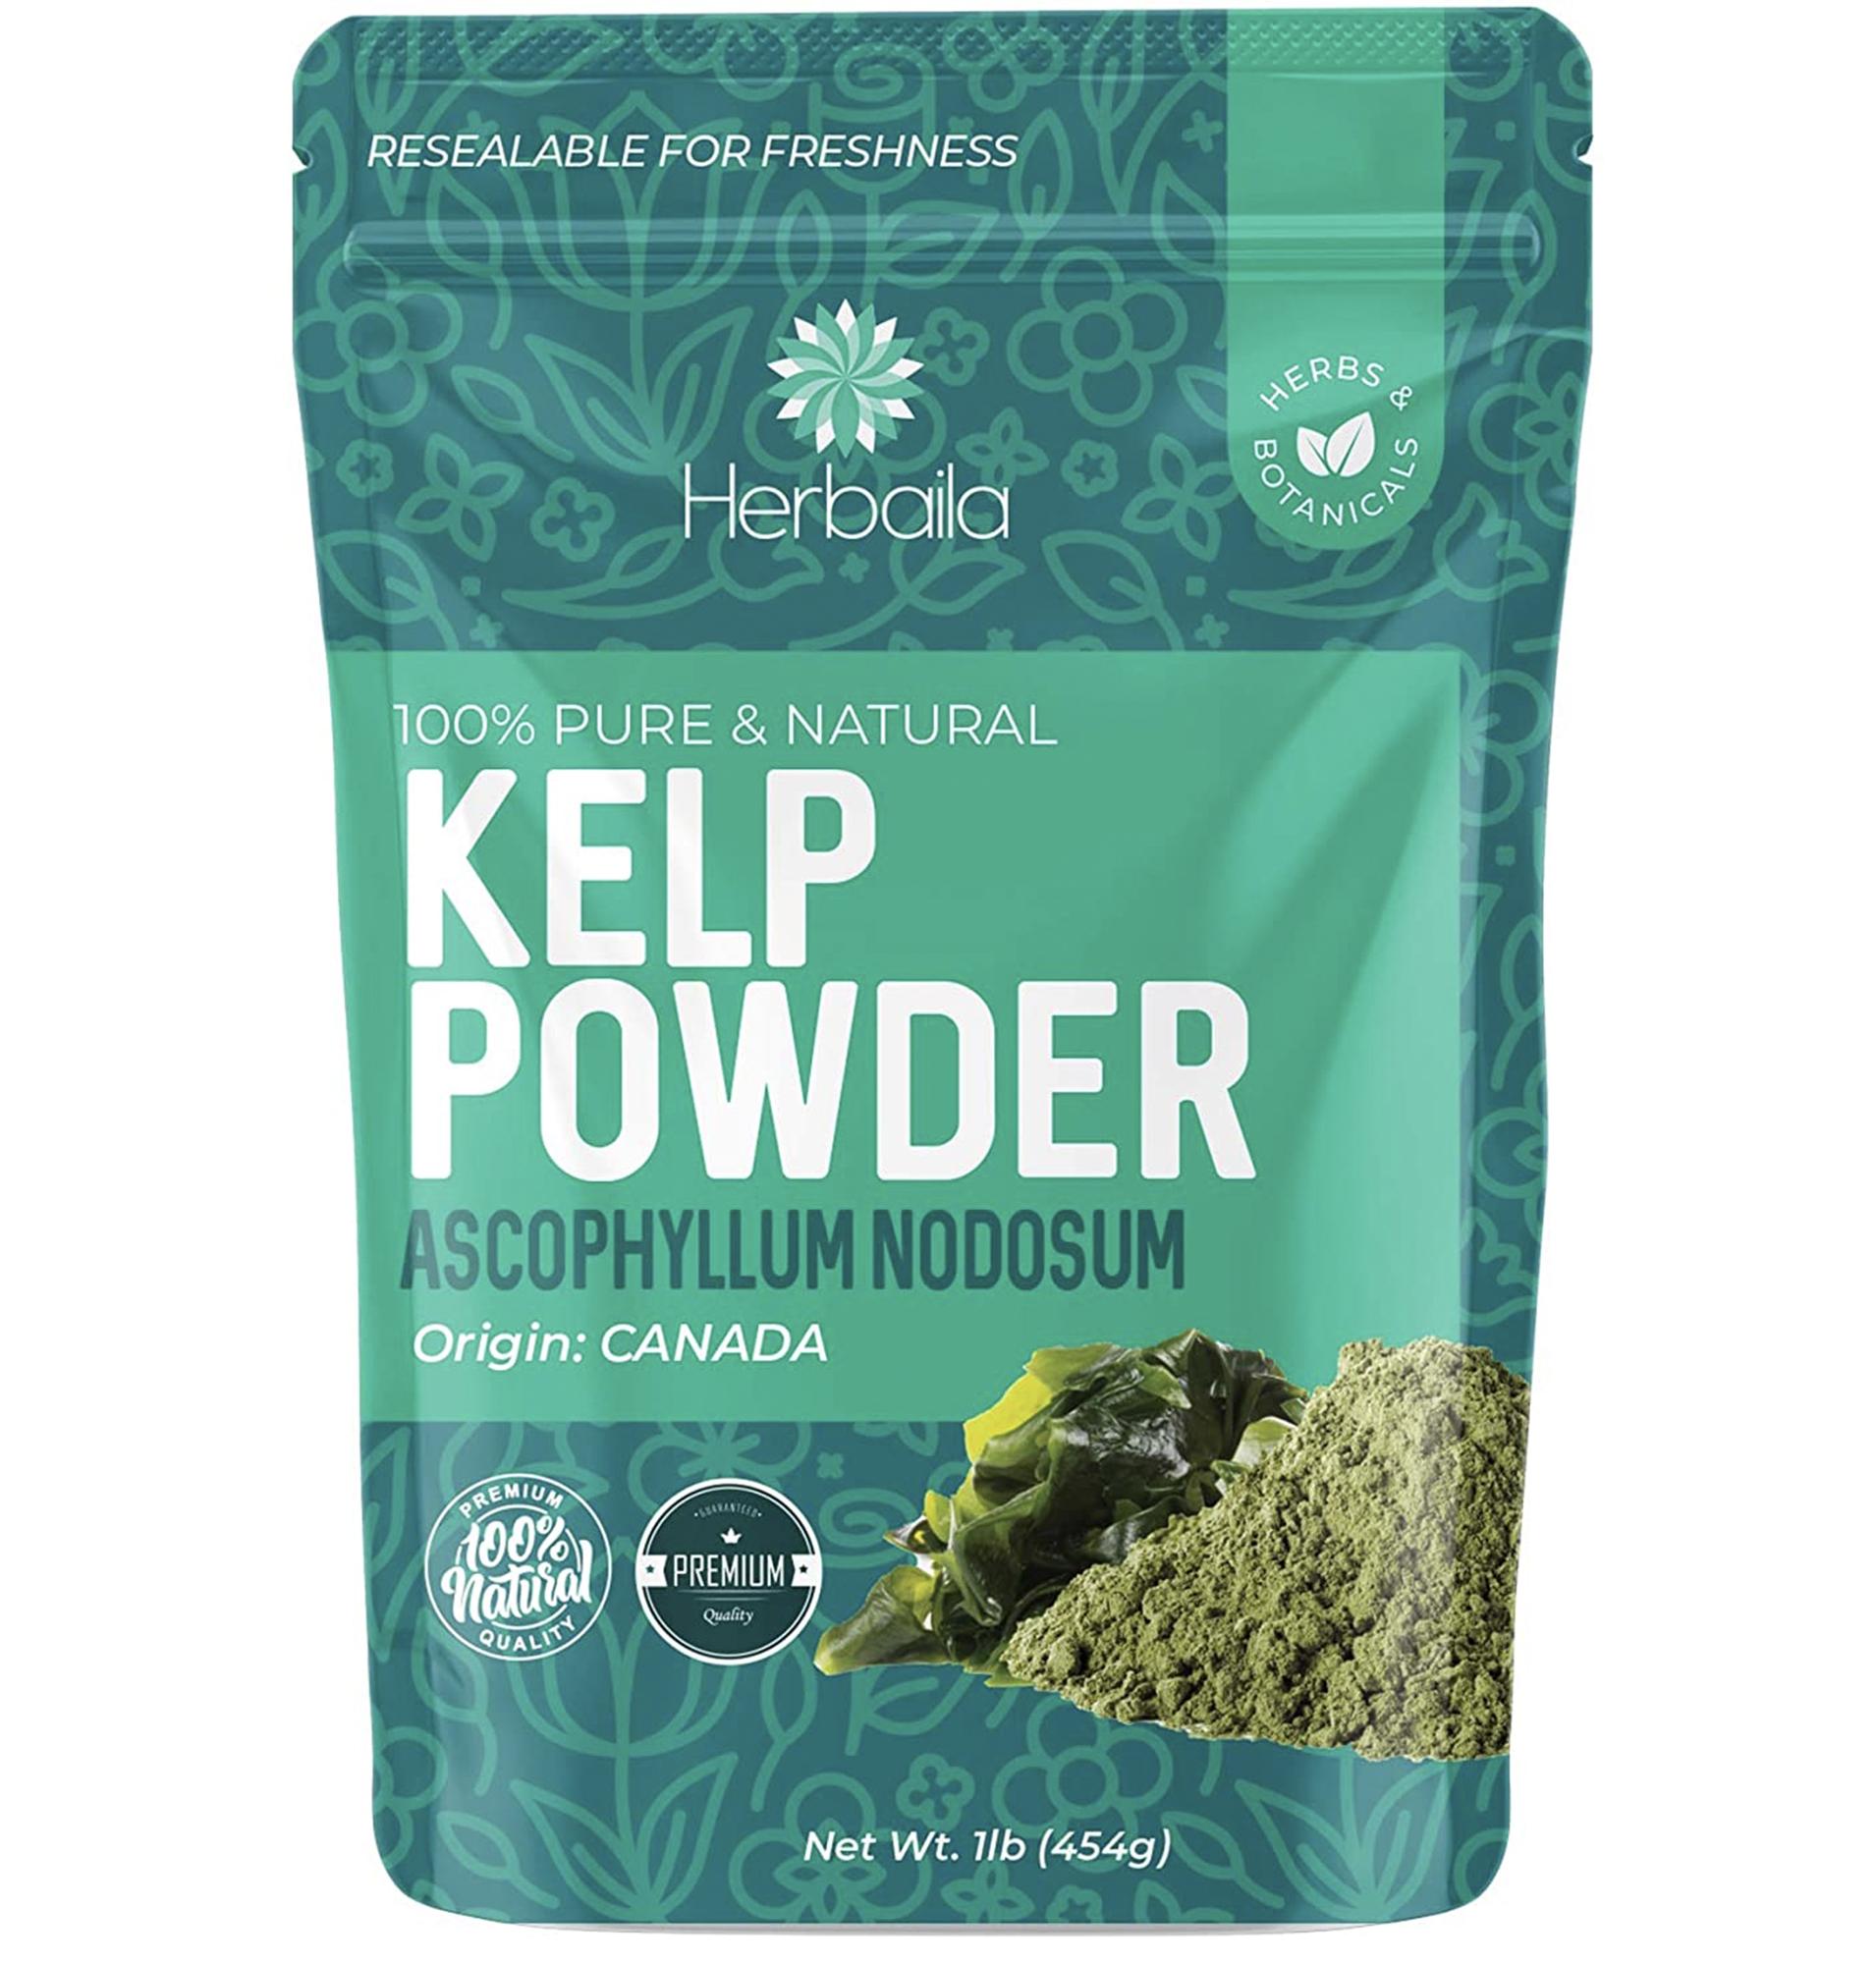 kelp powder web